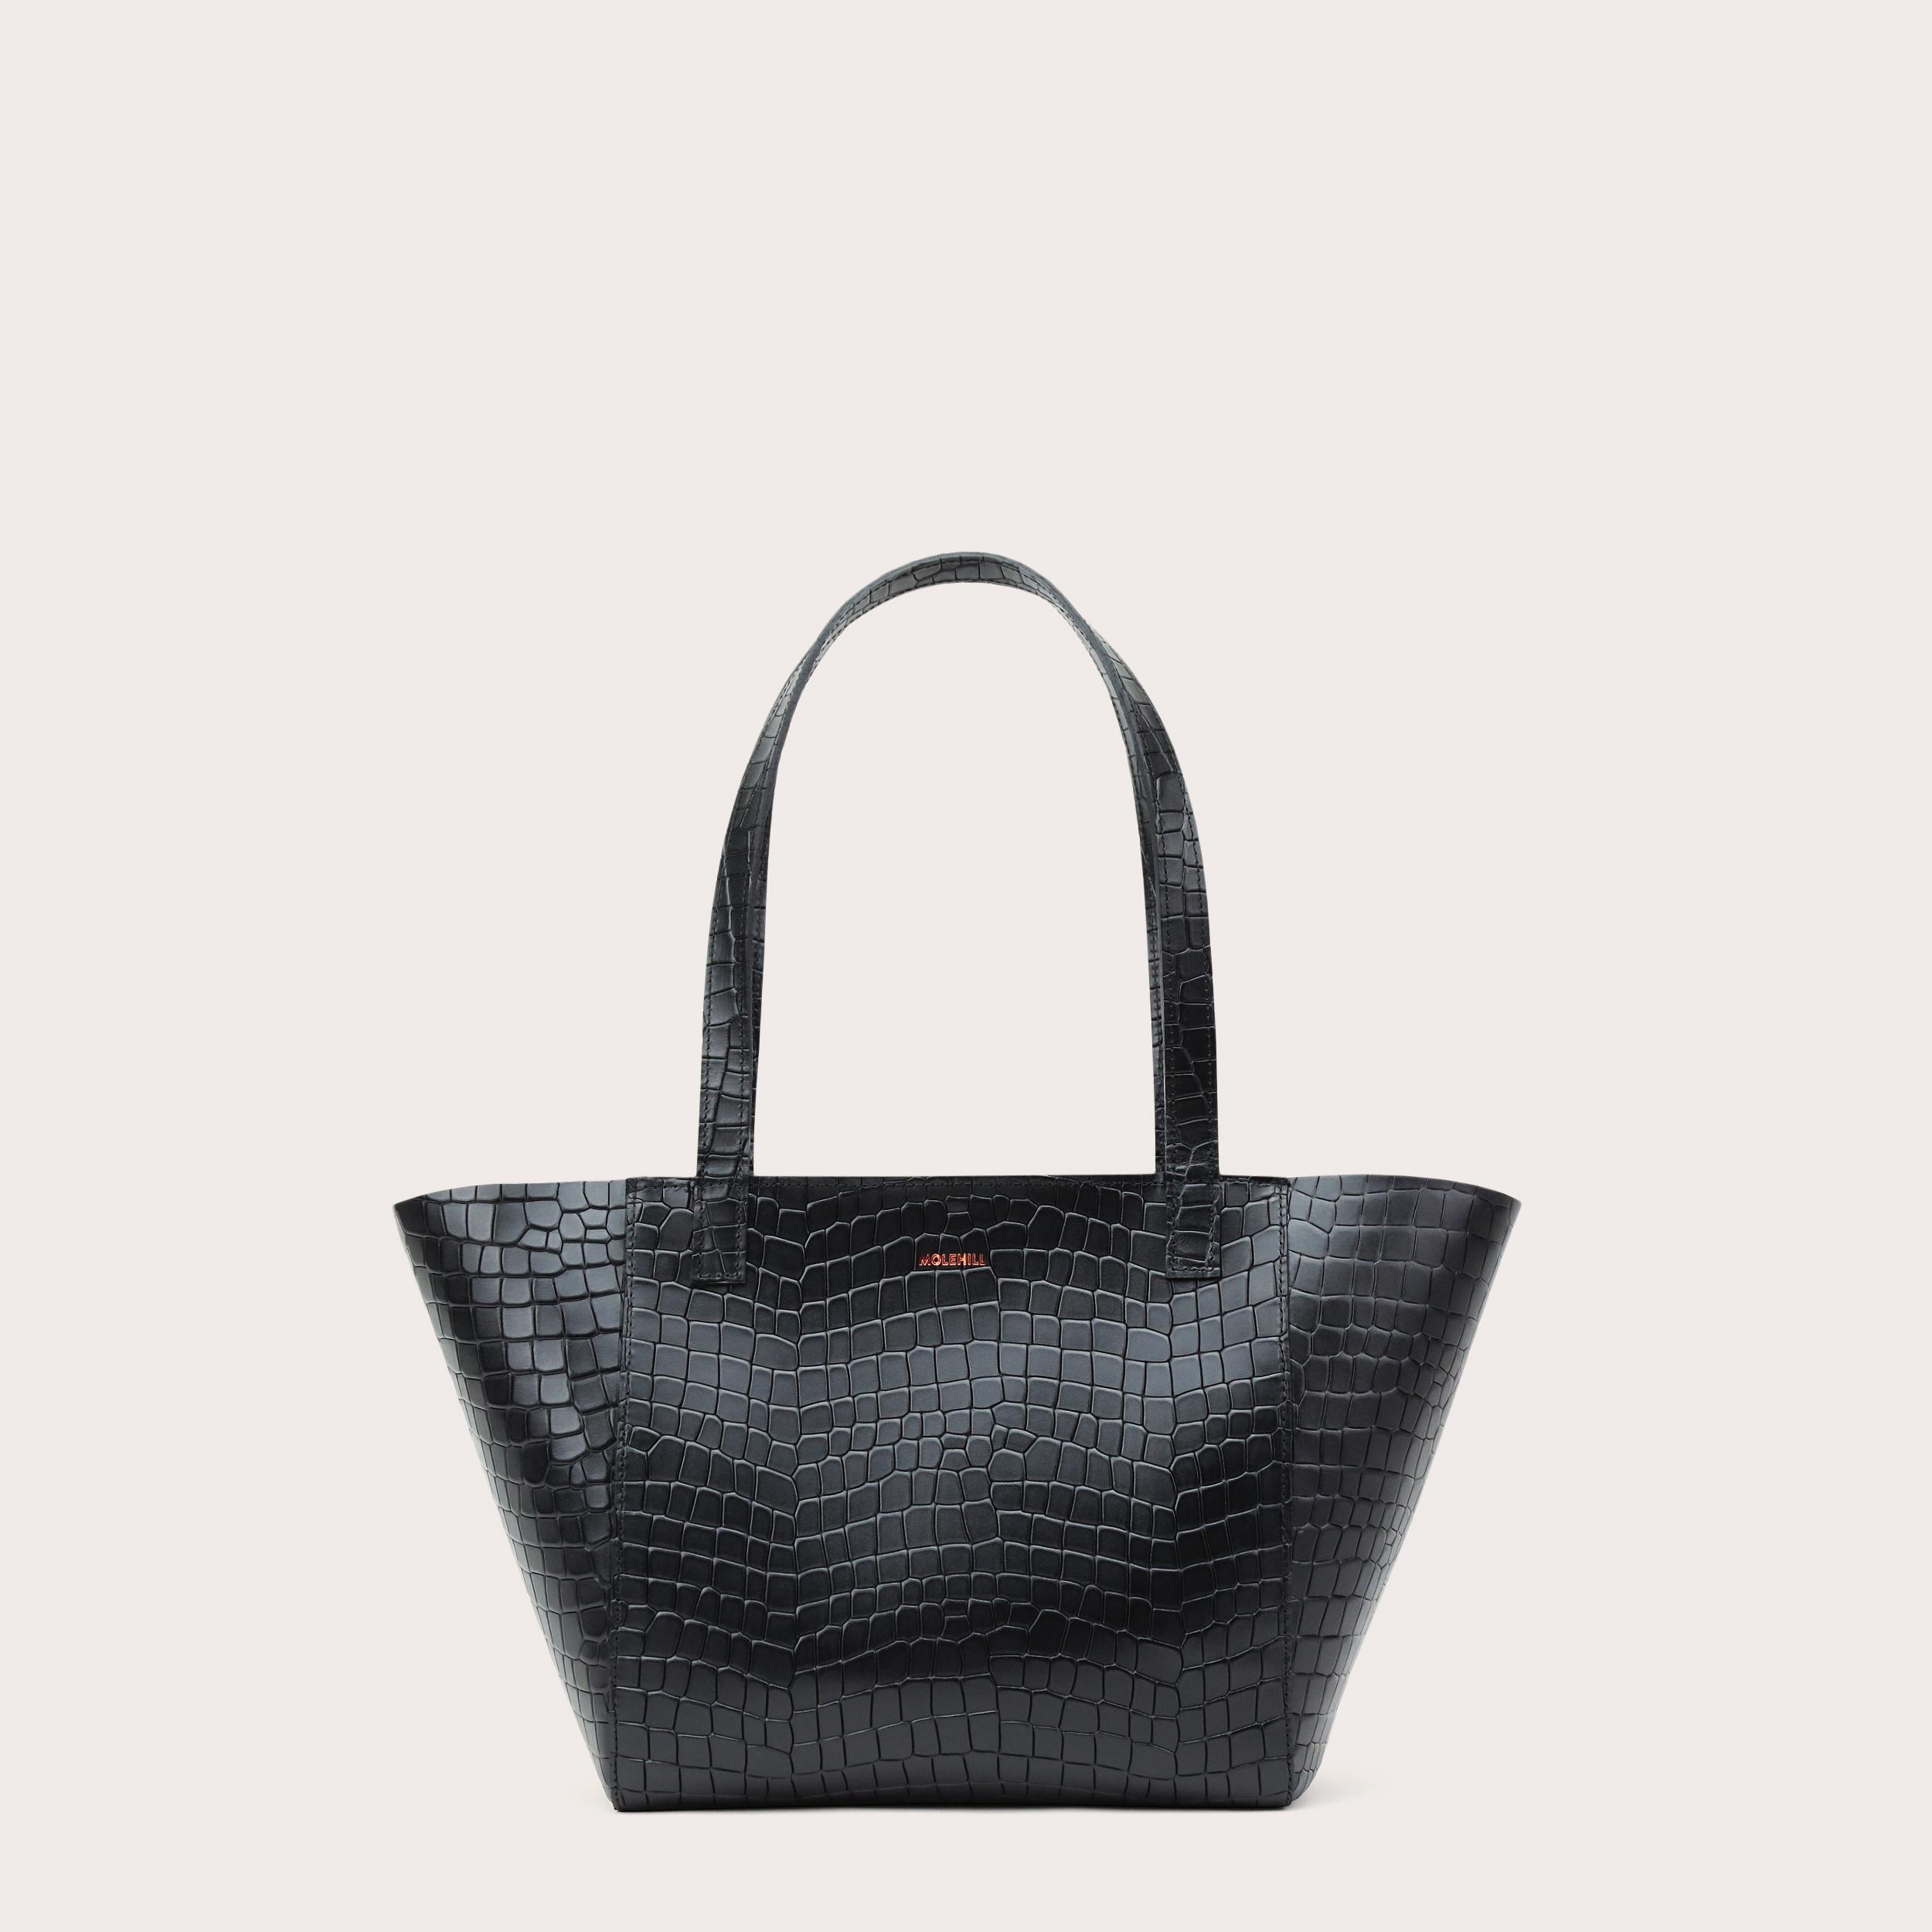 Torba ESTE Regular Zip Shopper Bag Croco Black 1-1